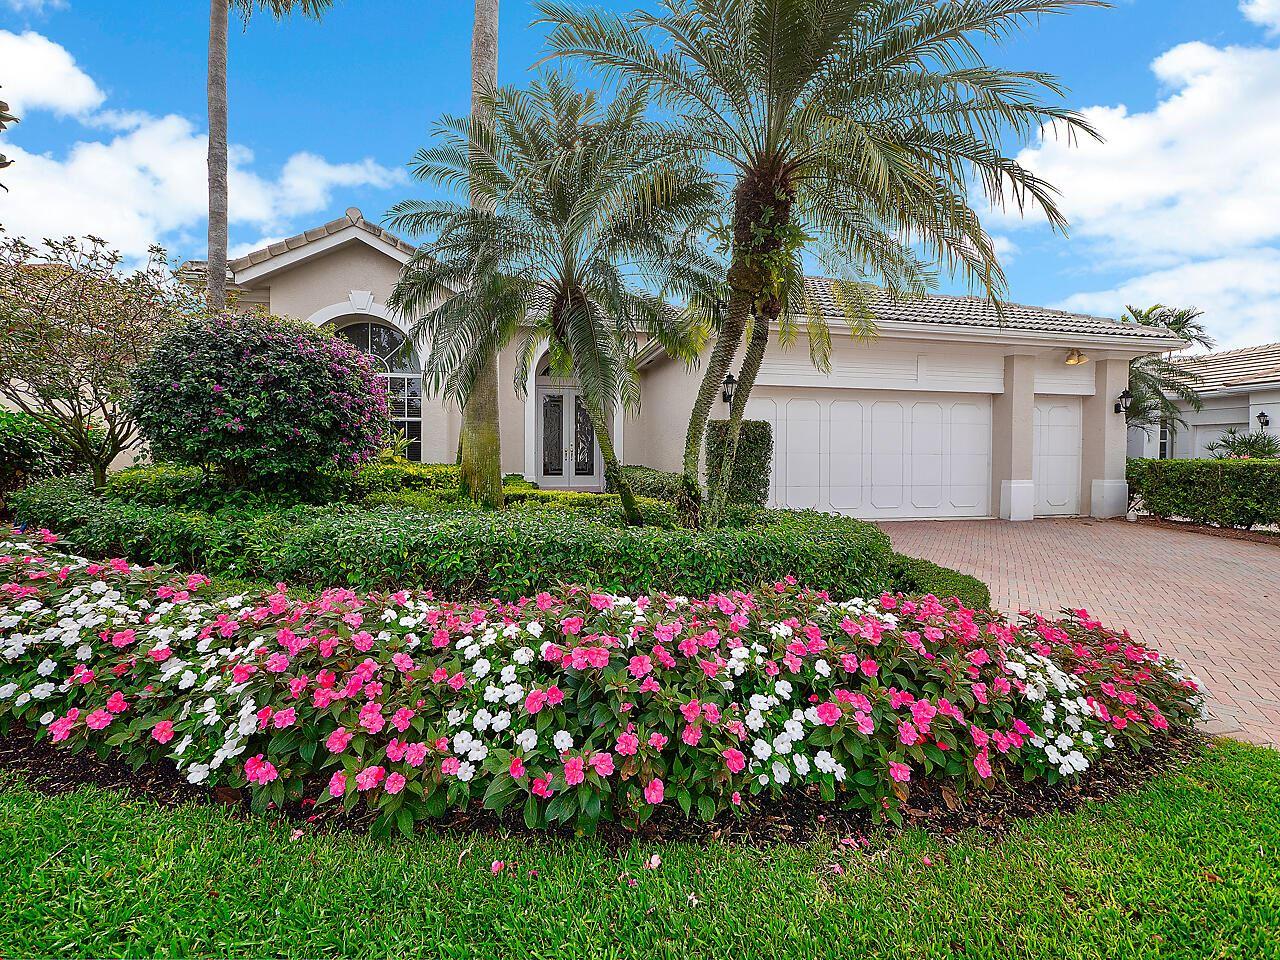 Photo of 126 Banyan Isle Drive, Palm Beach Gardens, FL 33418 (MLS # RX-10749862)